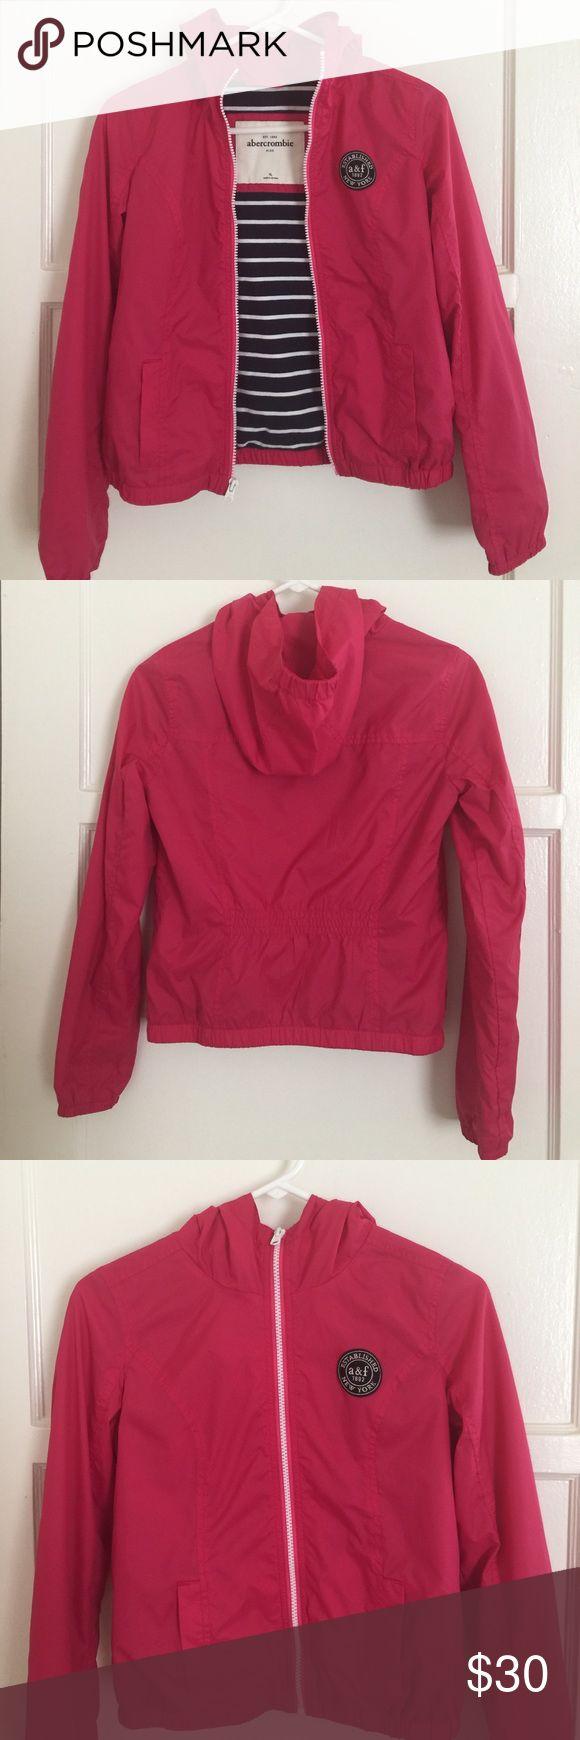 ❗️PRICE DROP❗️abercrombie kids jacket Slightly worn abercrombie wind breaker jacket for girls.  Inside lining is cotton.  Kept in excellent condition.  Very clean, damage & odor free! abercrombie kids Jackets & Coats